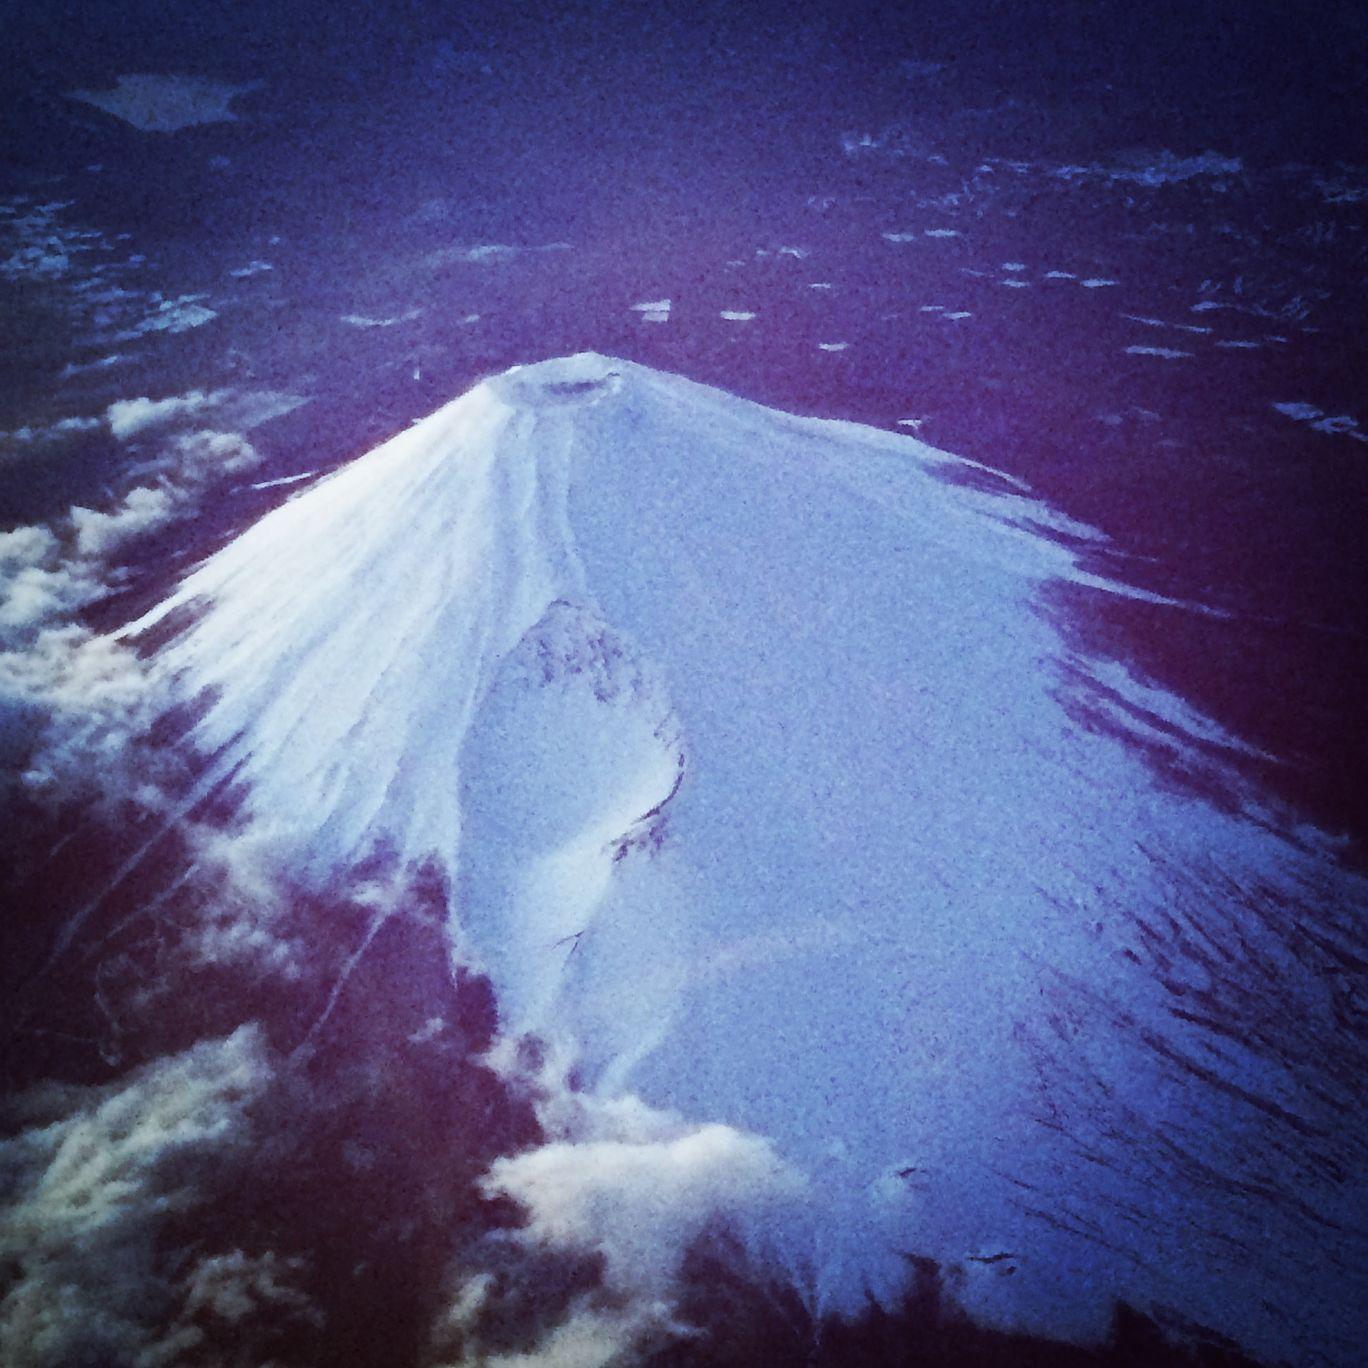 Photo of Mount Fuji By Aanchal Bhasin